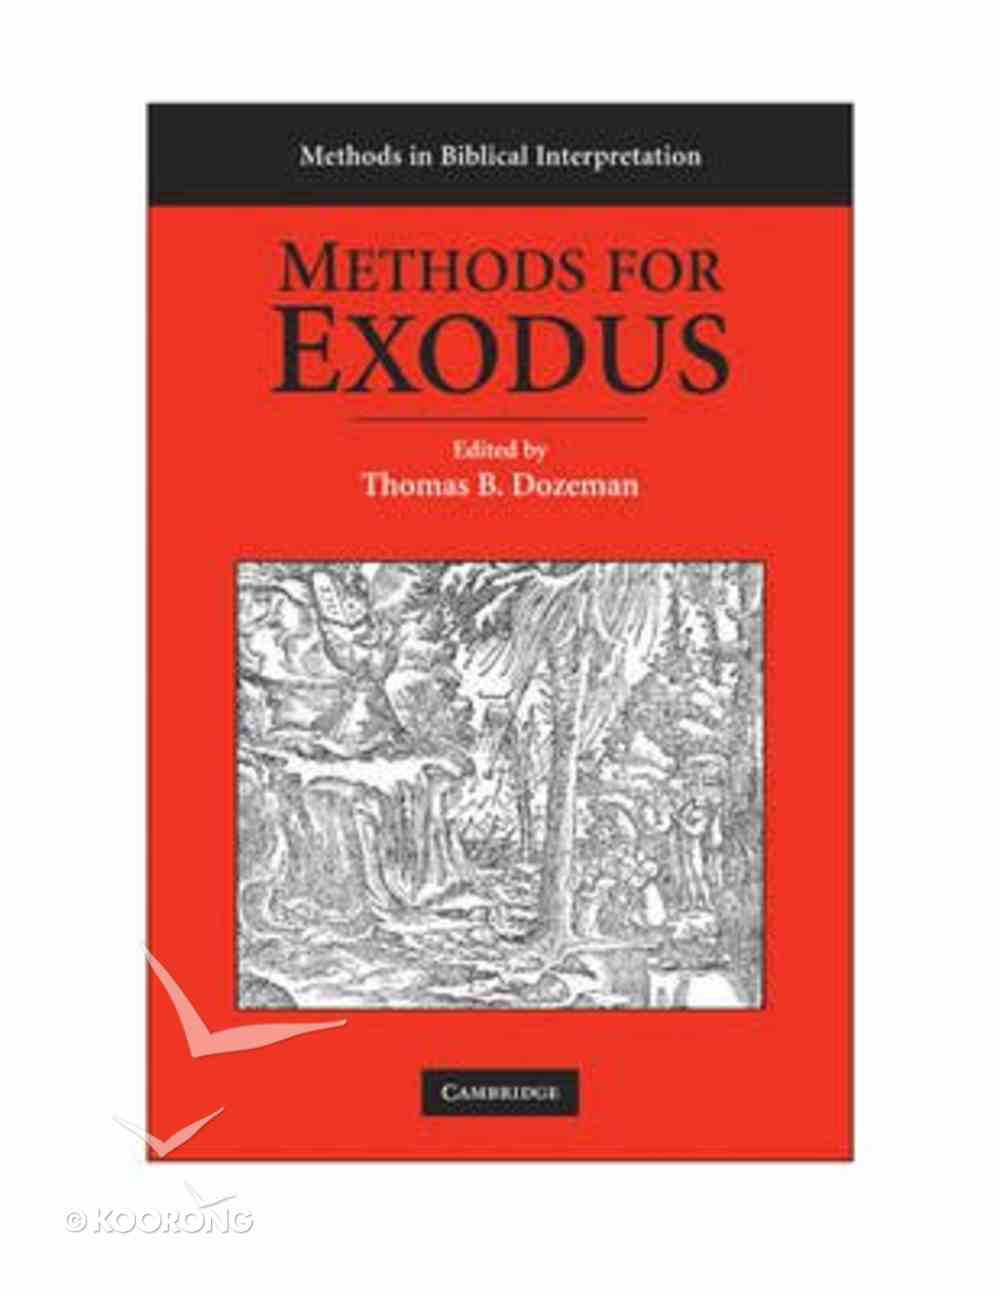 Methods For Exodus (Methods In Biblical Interpretation Series) Paperback